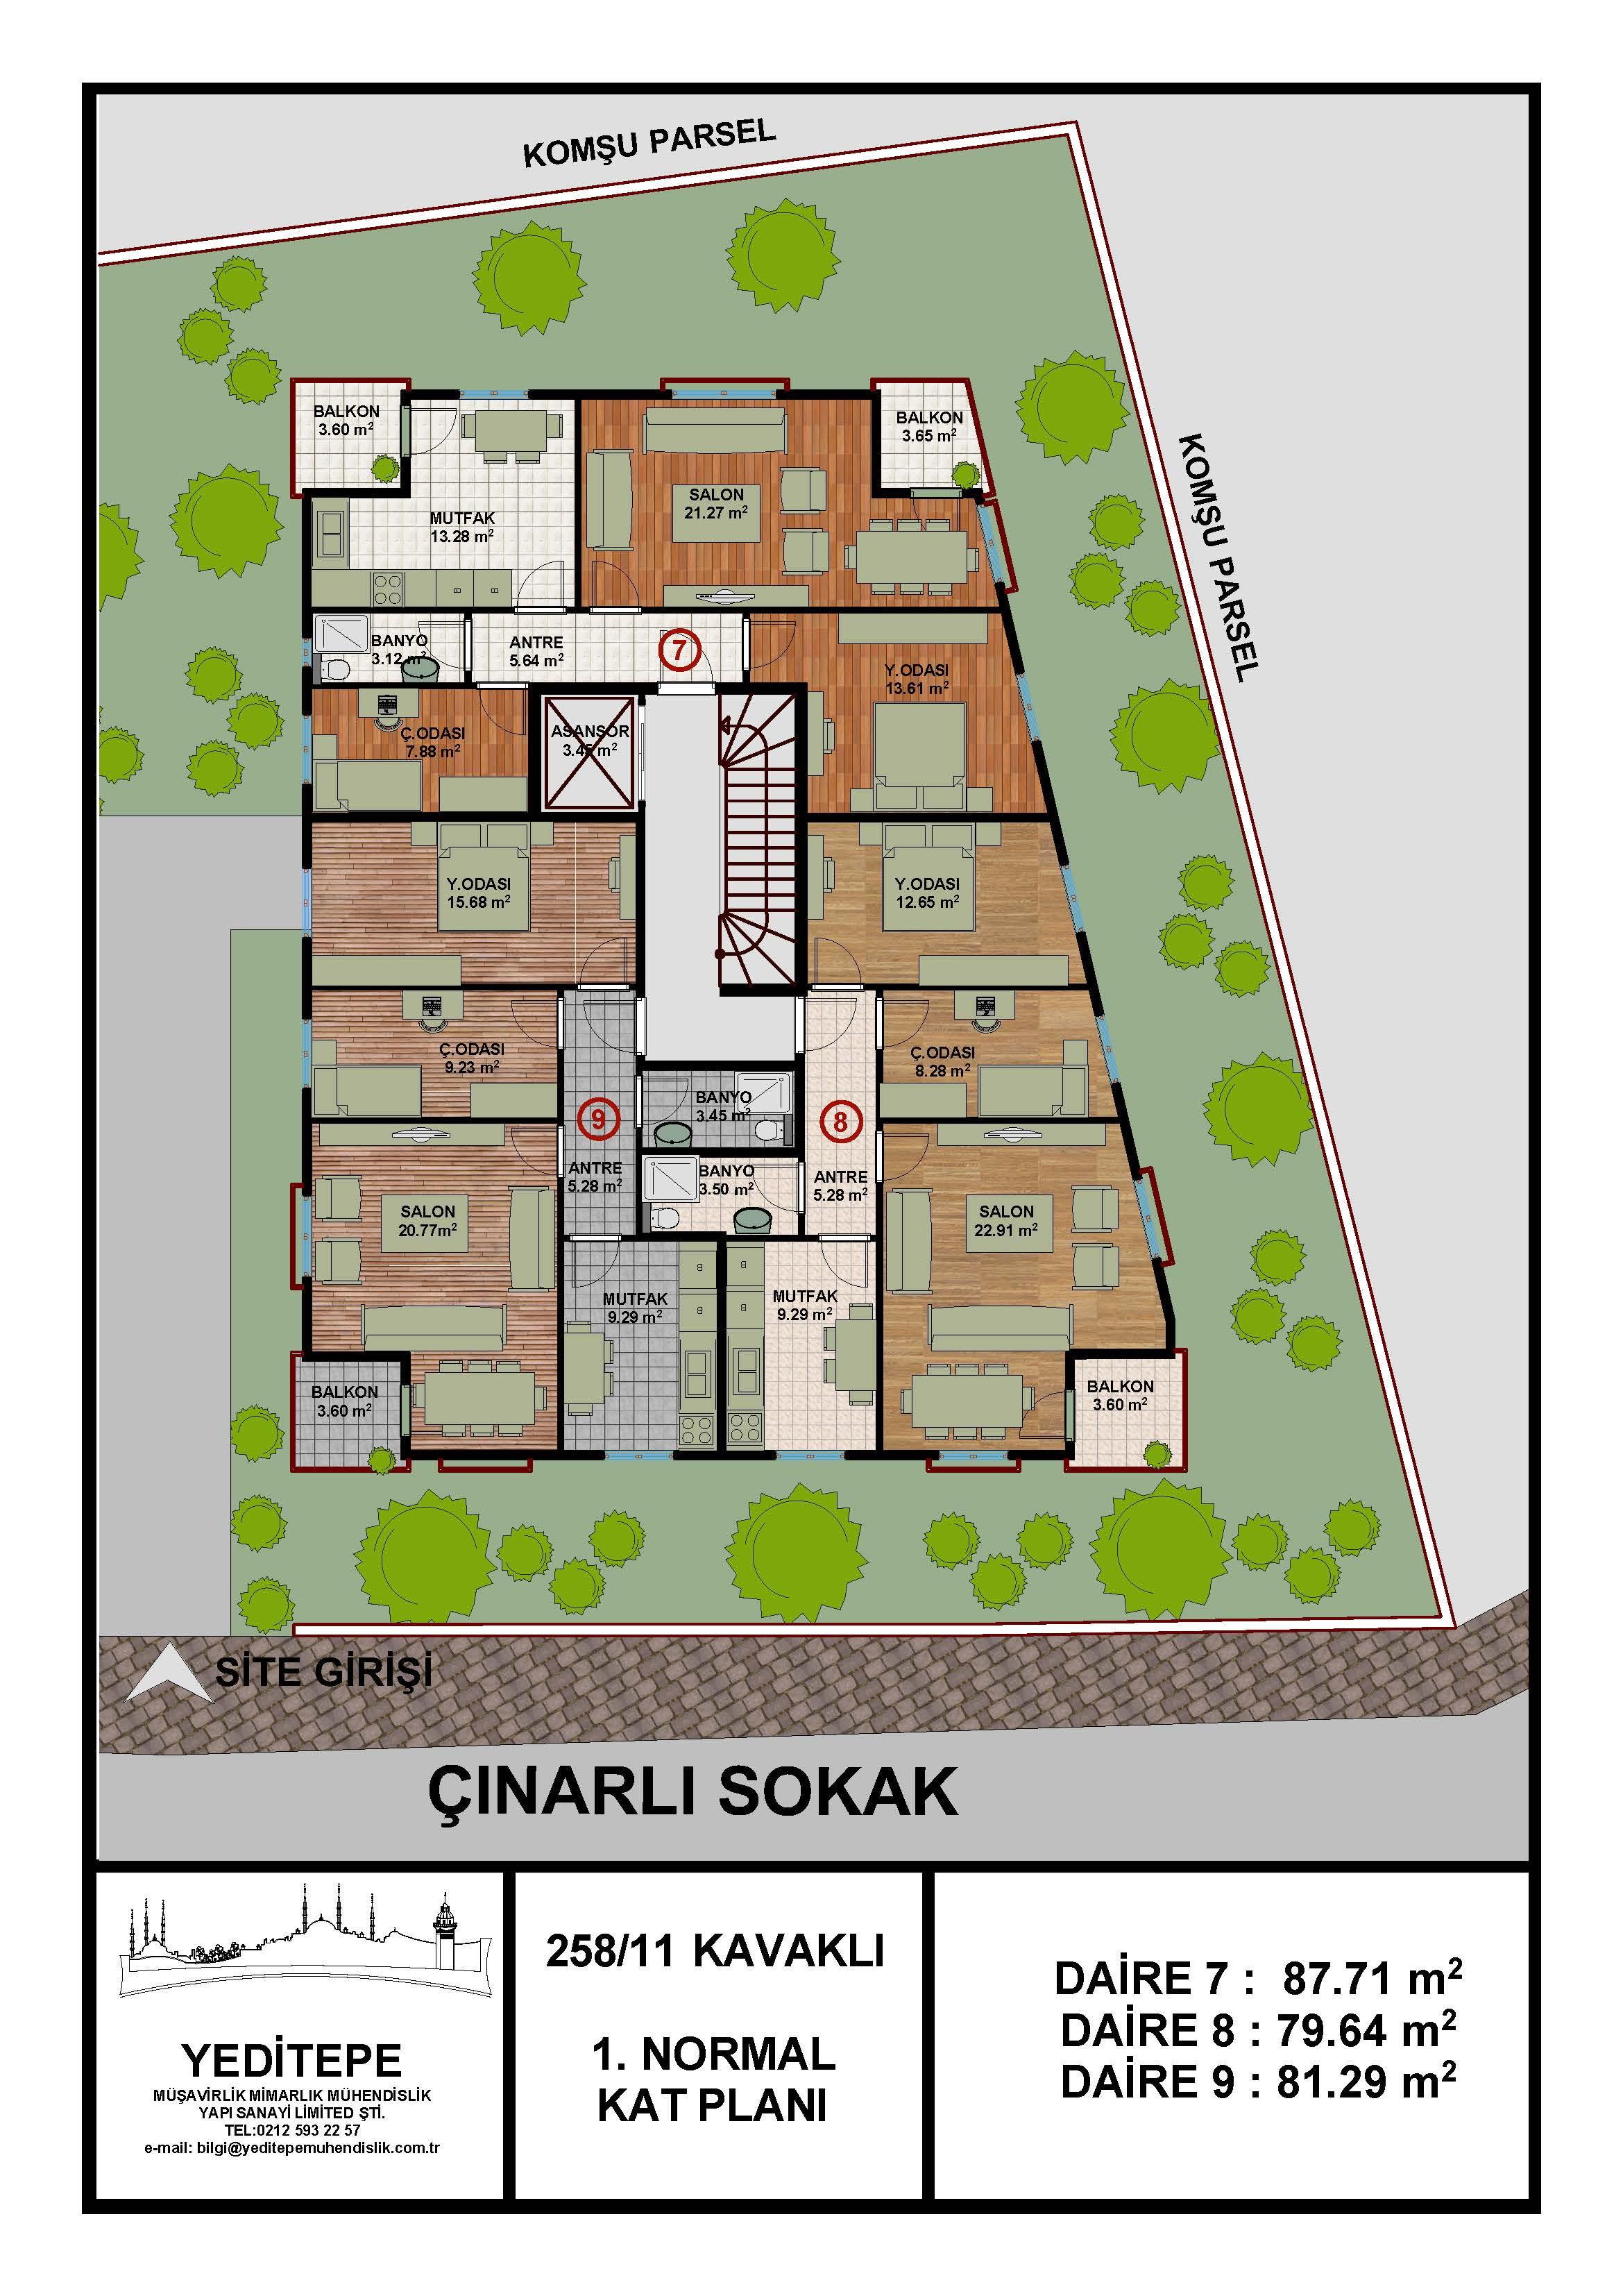 Sinan KORKMAZ 1.Normal Kat